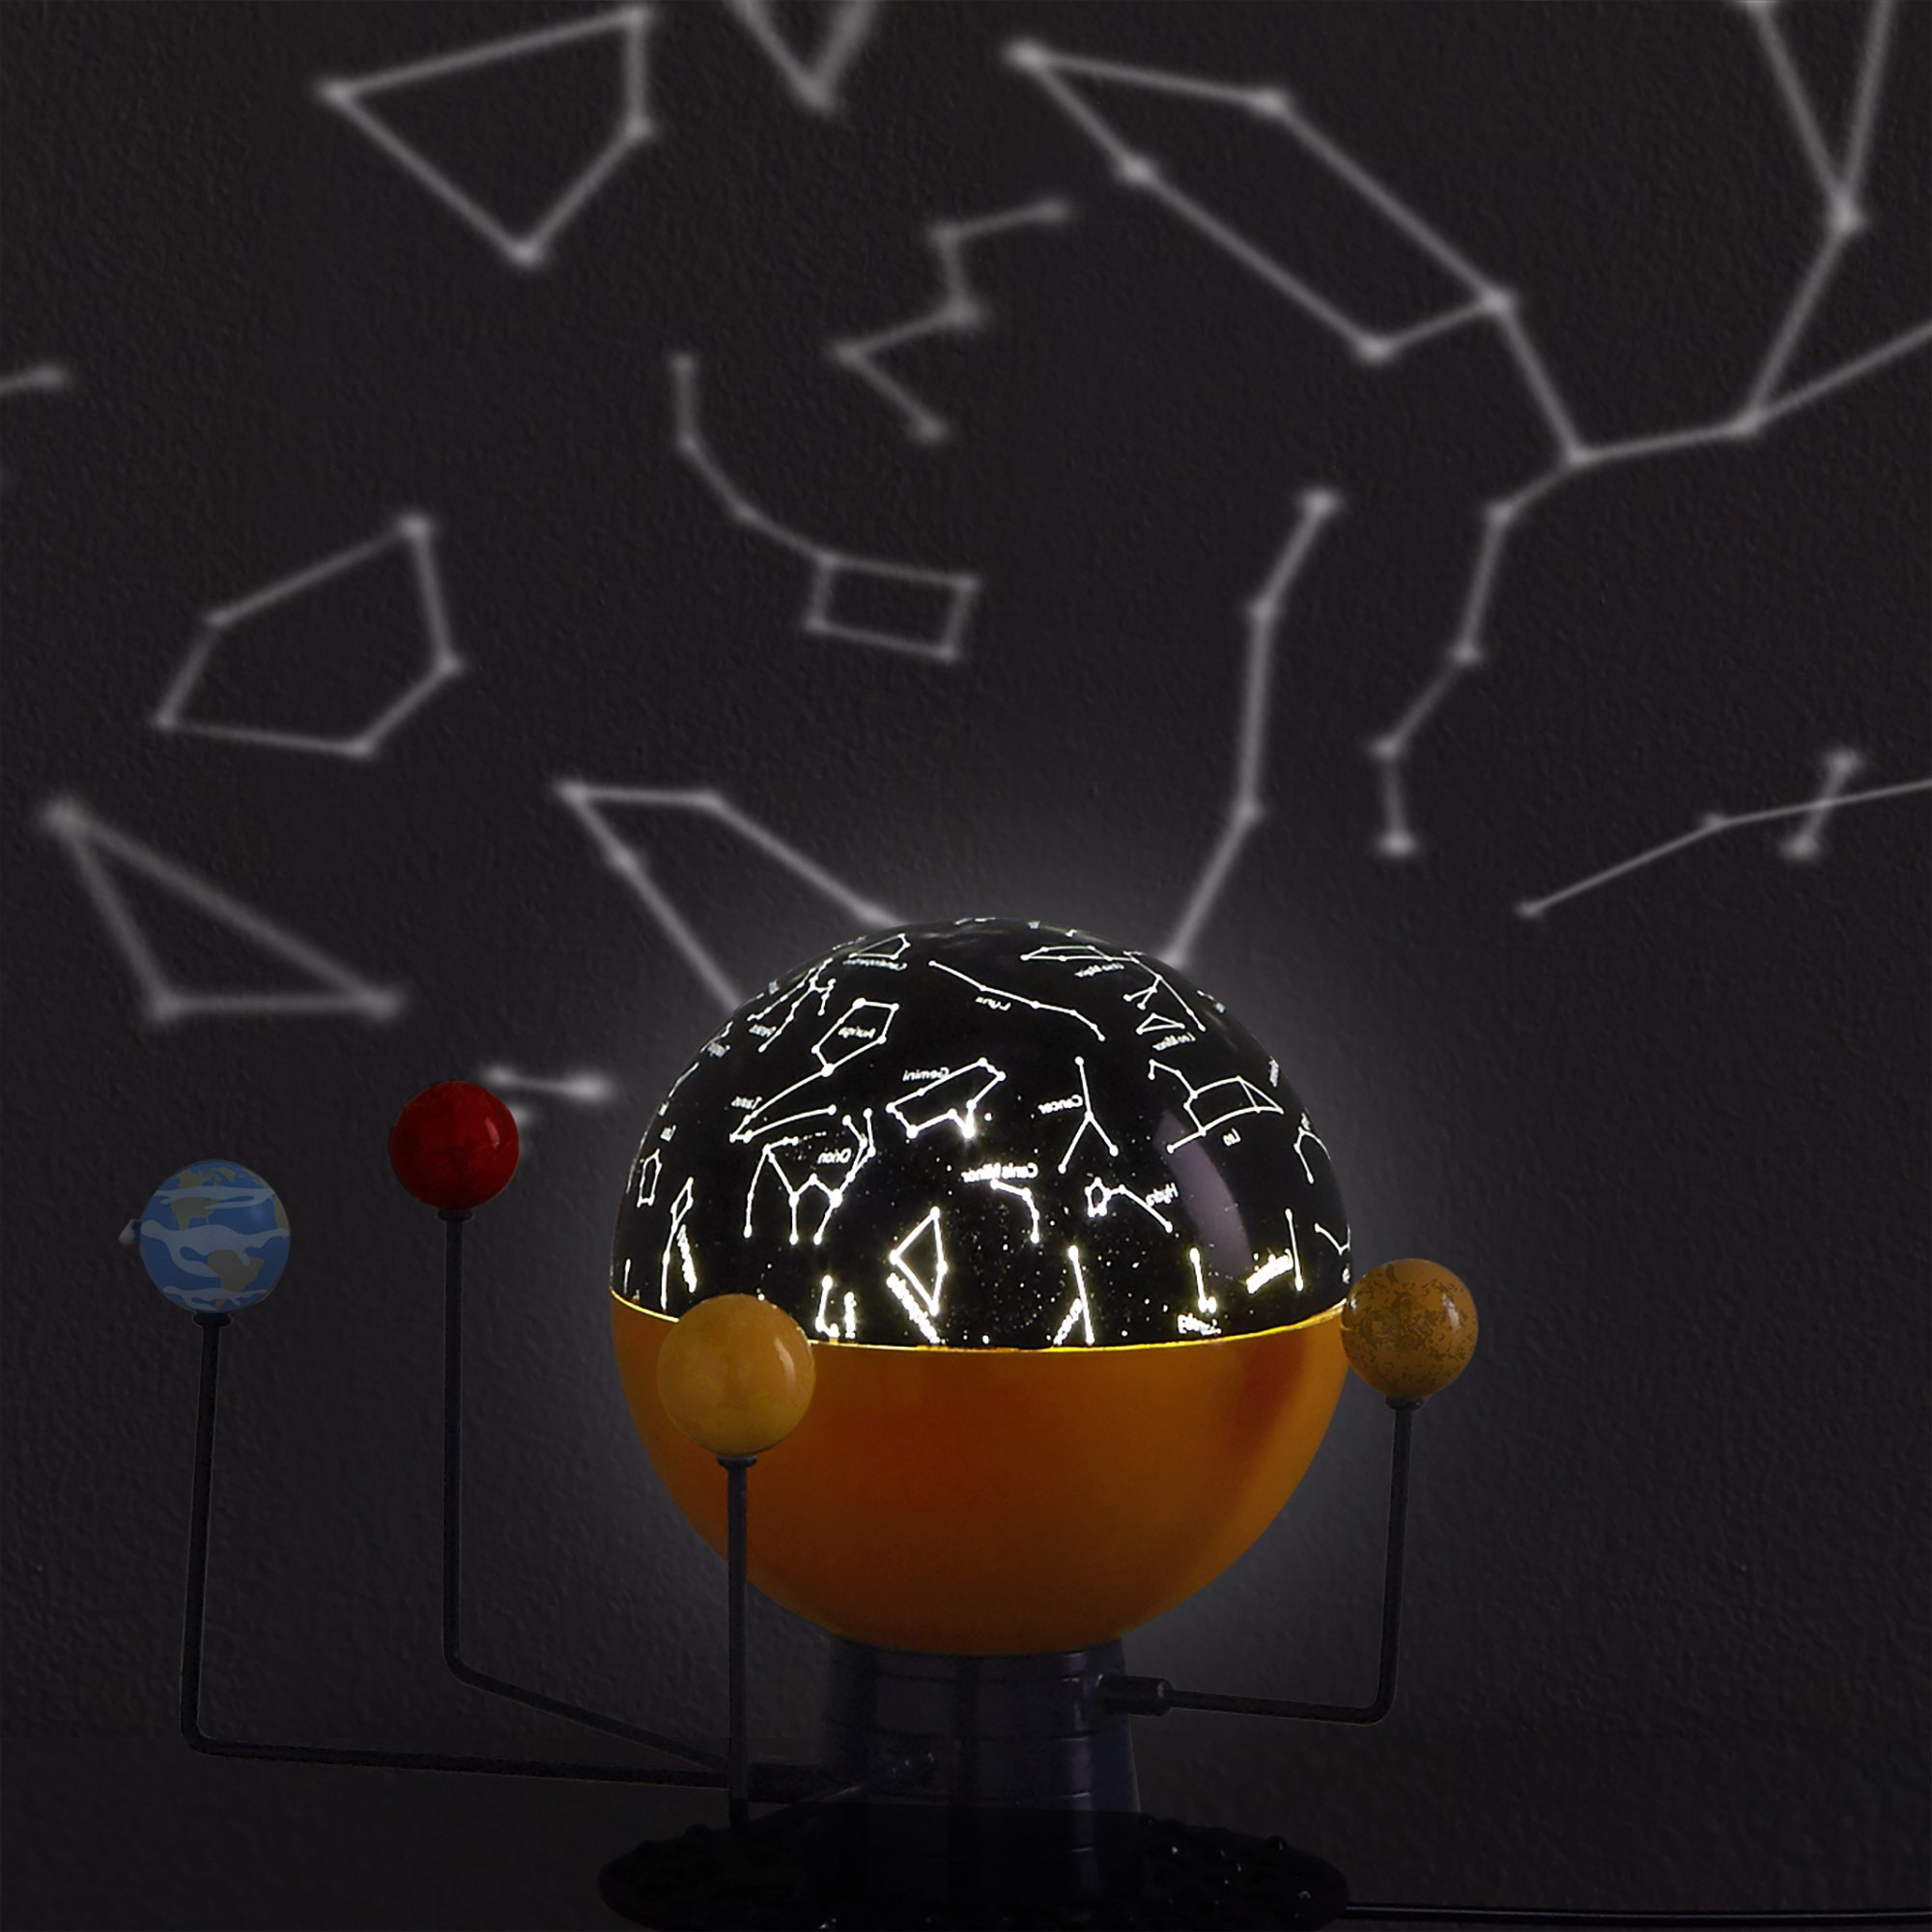 Educational Insights Geosafari Motorized Solar System Science Kit by Educational Insights (Image #3)